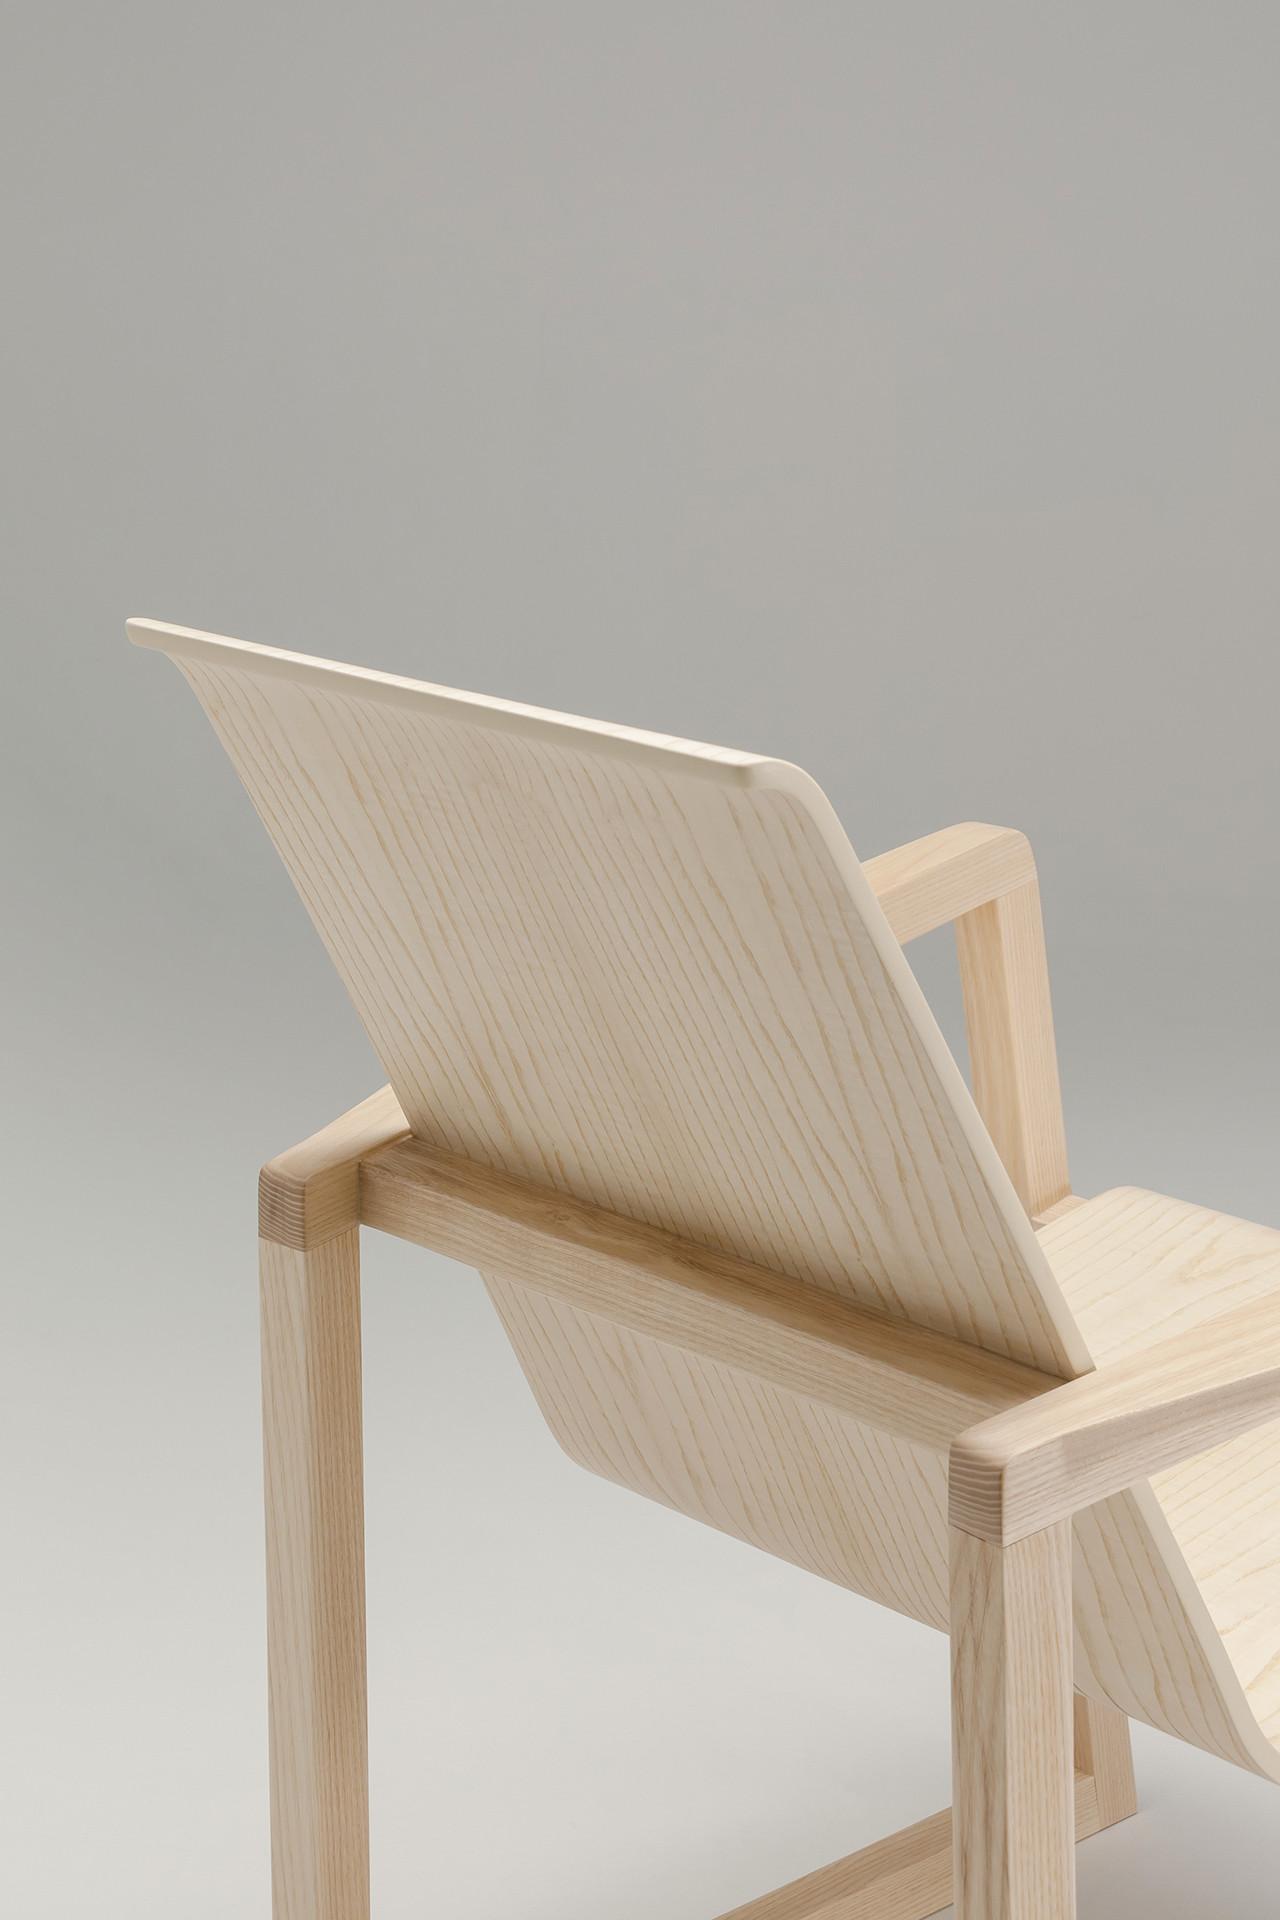 Serene-Easy-Chair_2_1280x1920_72dpi.jpg